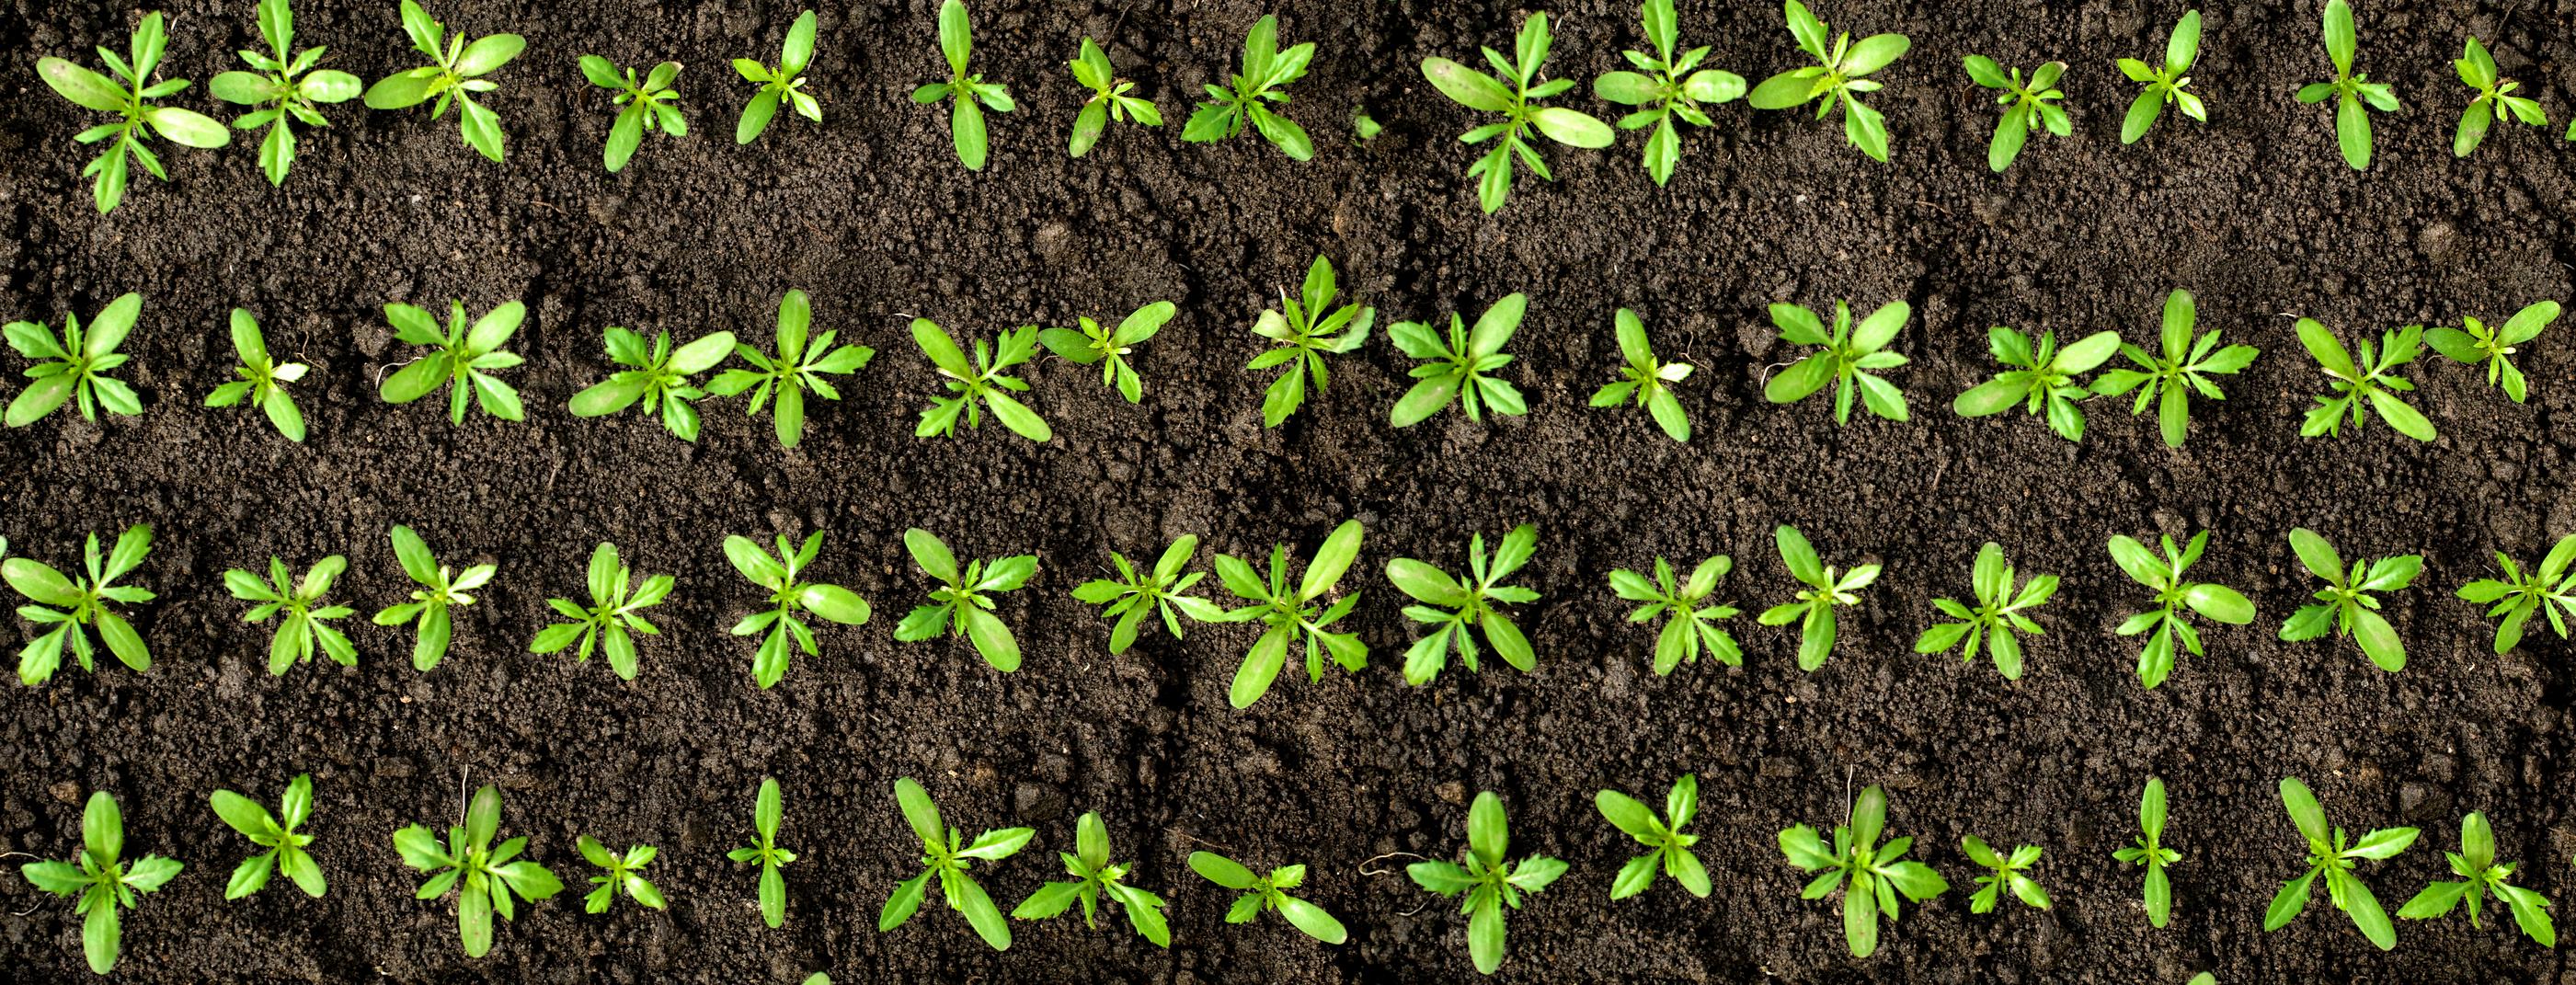 dreamstime_m_8685171 new planting.jpg